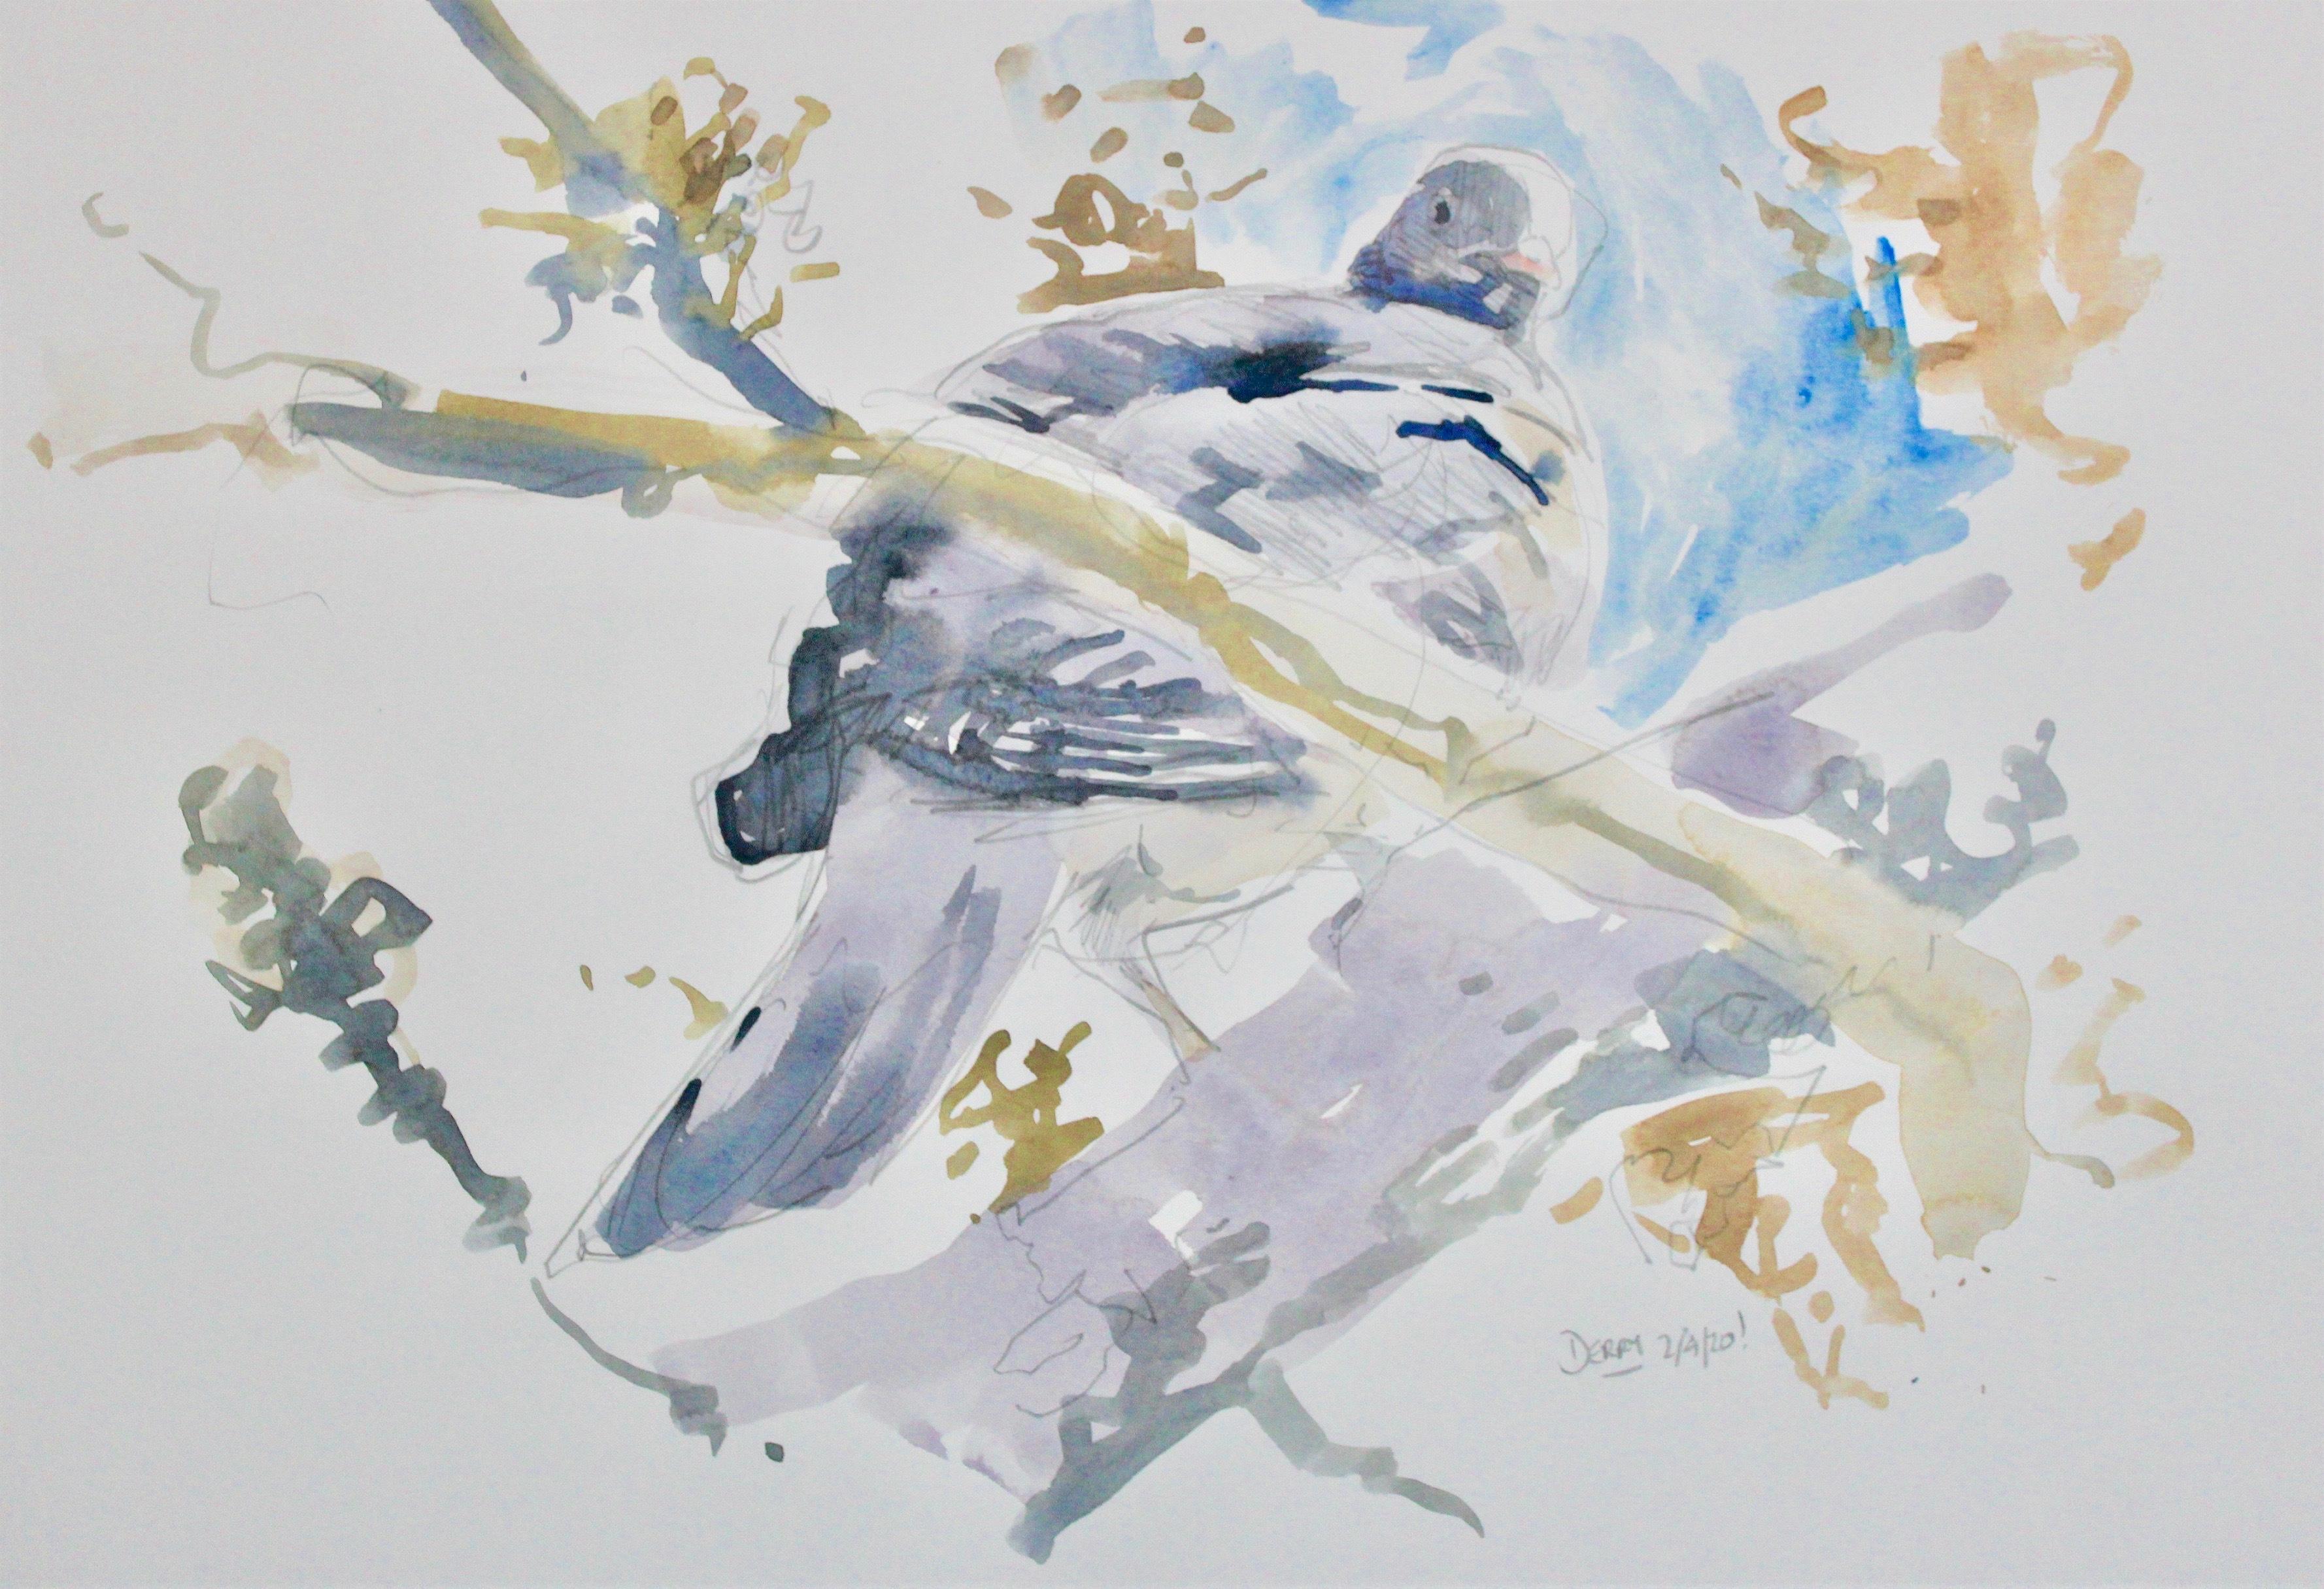 <p>Woodpigeon by Nick Derry</p>